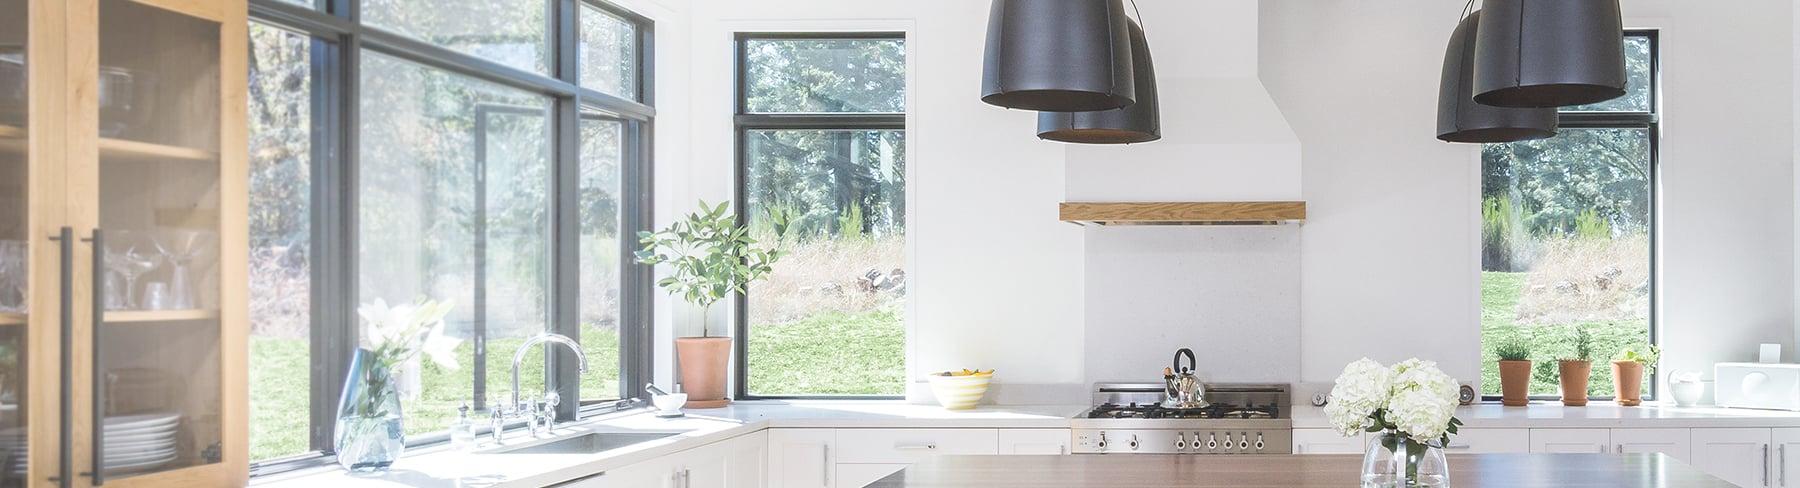 Cheap Replacement Windows in Austin, Helotes, New Braunfels, San Antonio